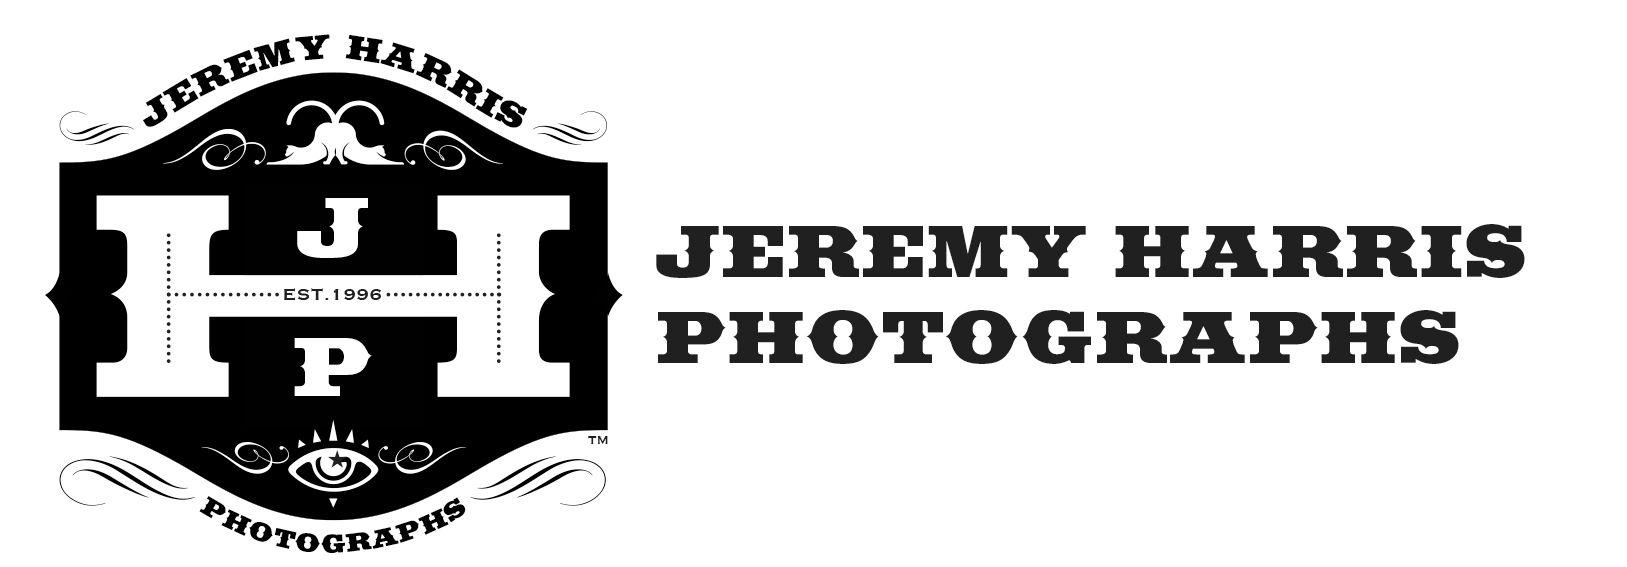 JEREMY HARRIS PHOTOGRAPHS